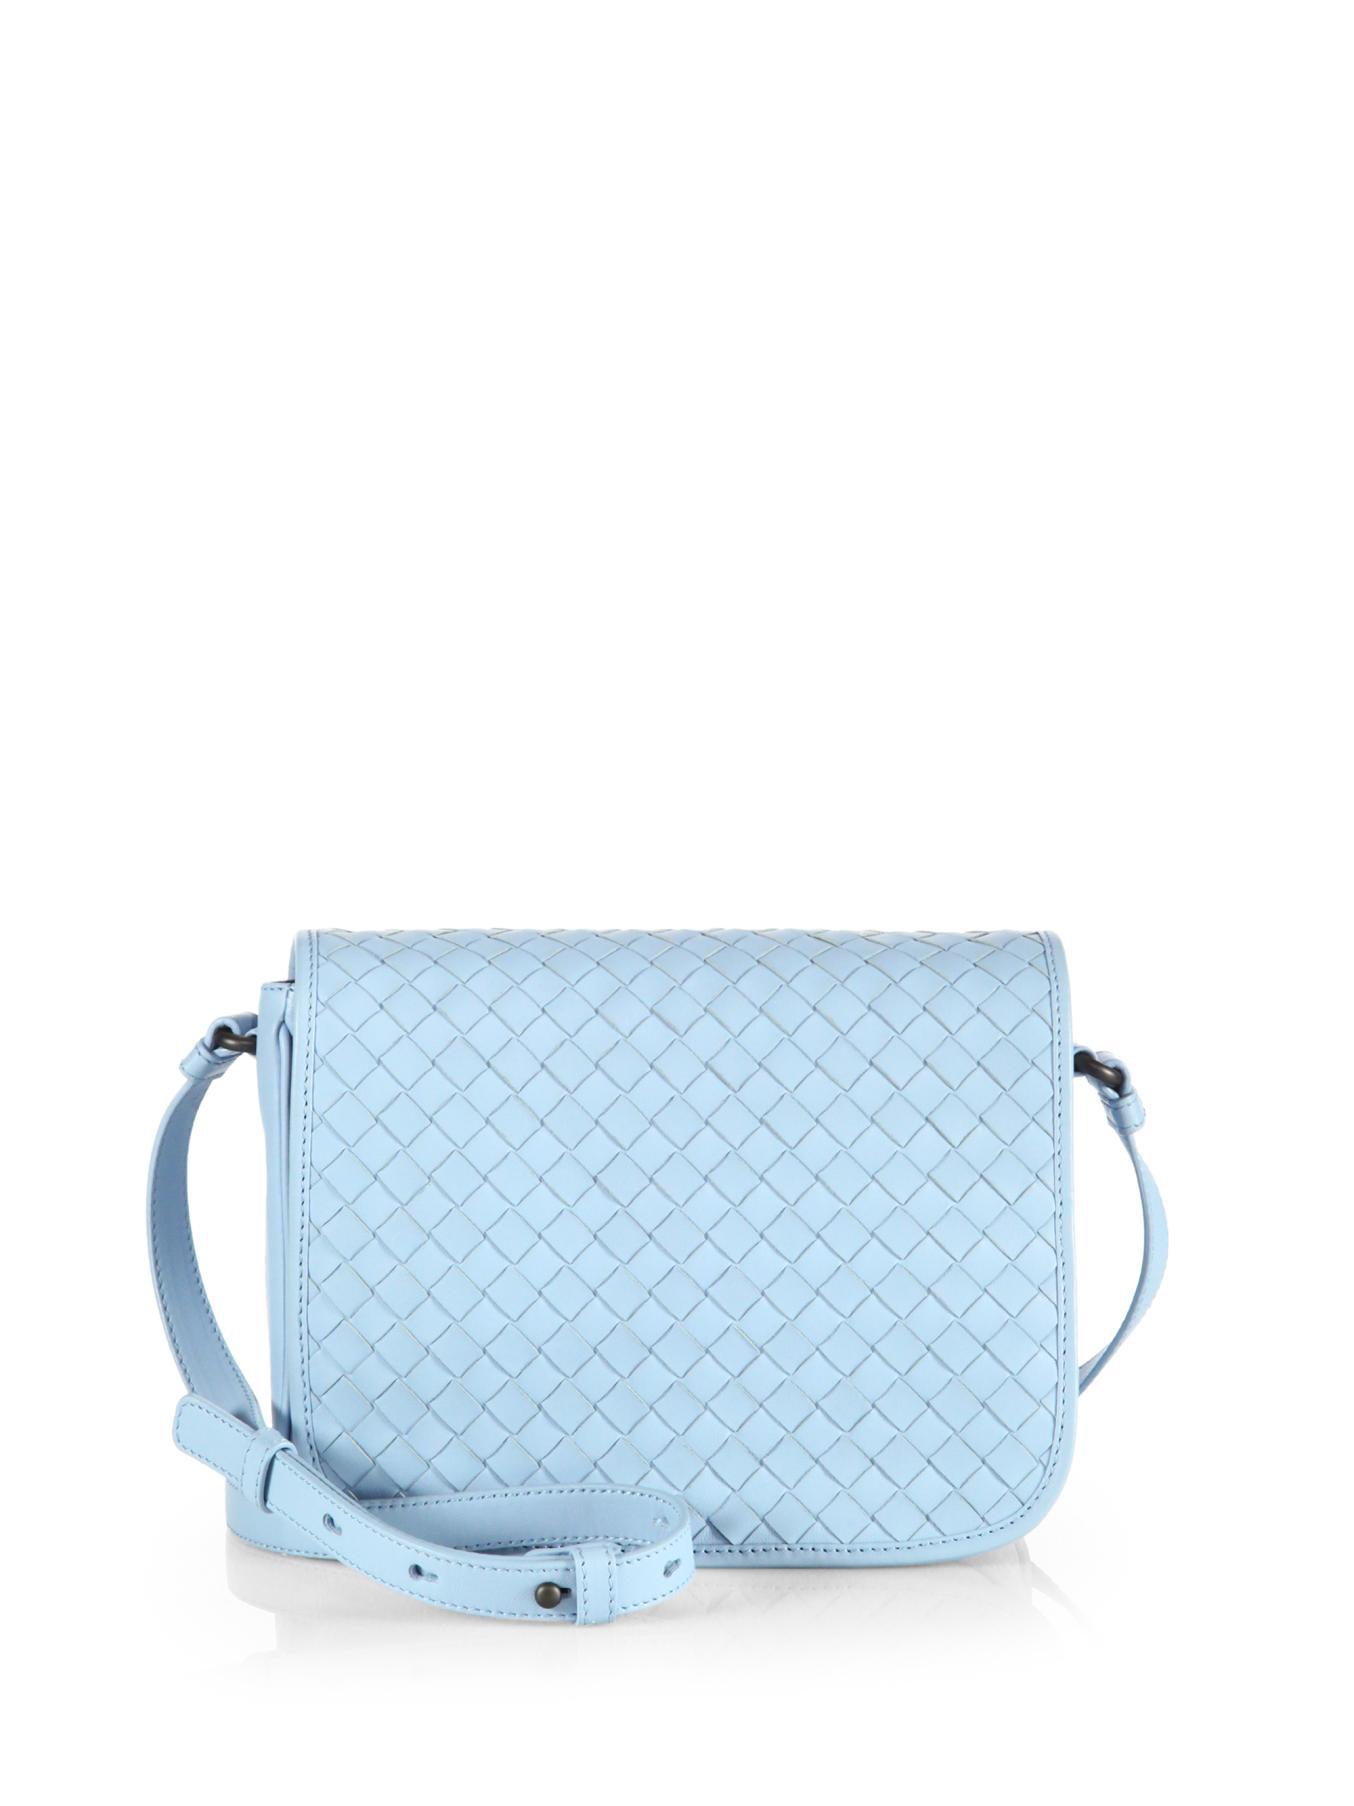 205fc41001 Lyst - Bottega Veneta Small Woven Flap Shoulder Bag in Blue for Men